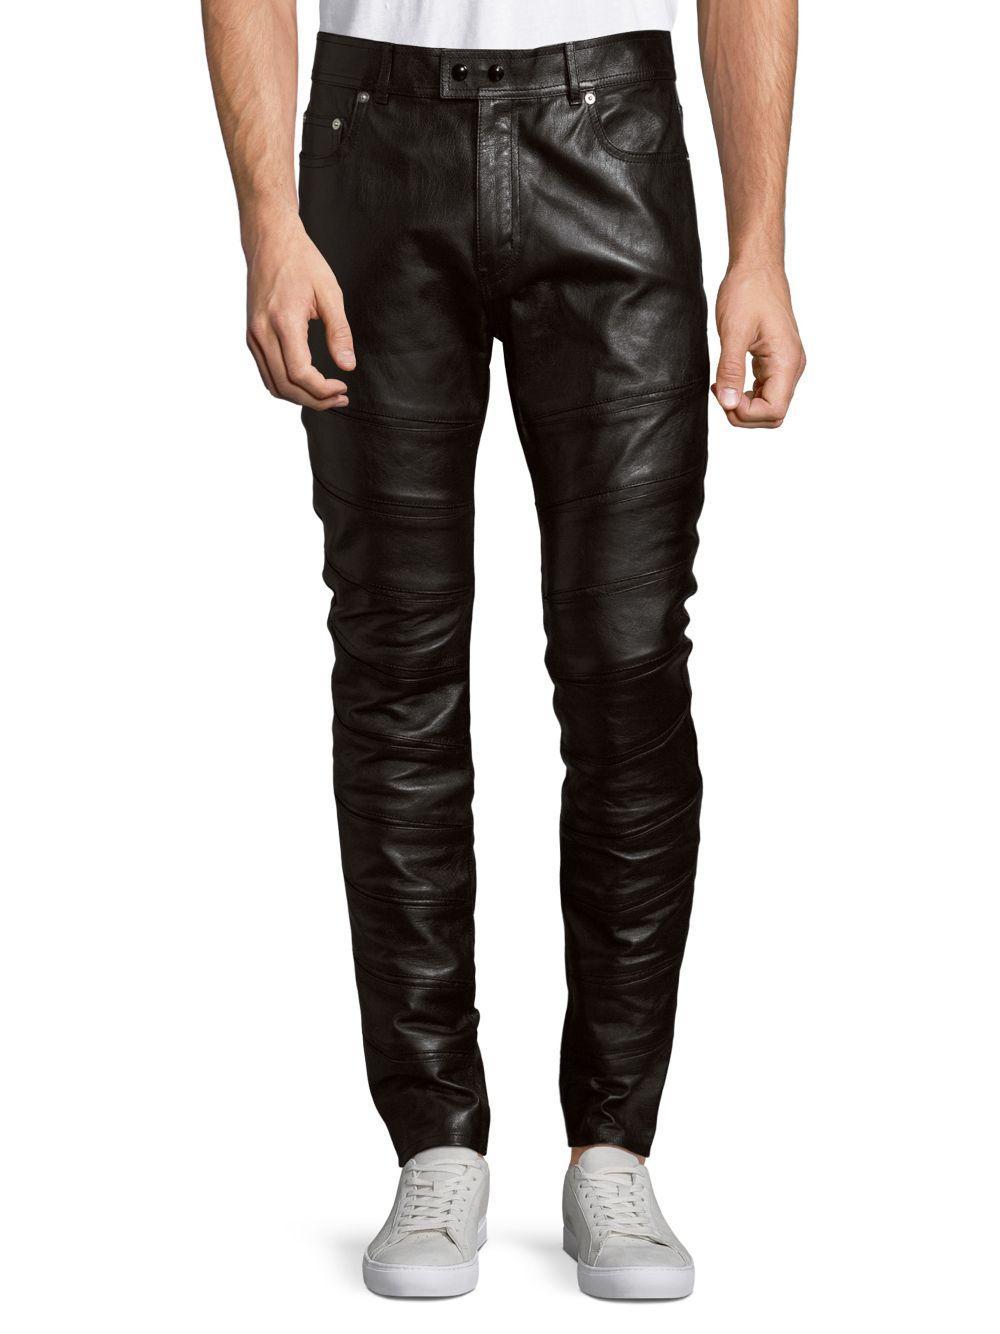 mens lambskin leather pants slim fit 5 pocket jean style black 32 34 36 38 40